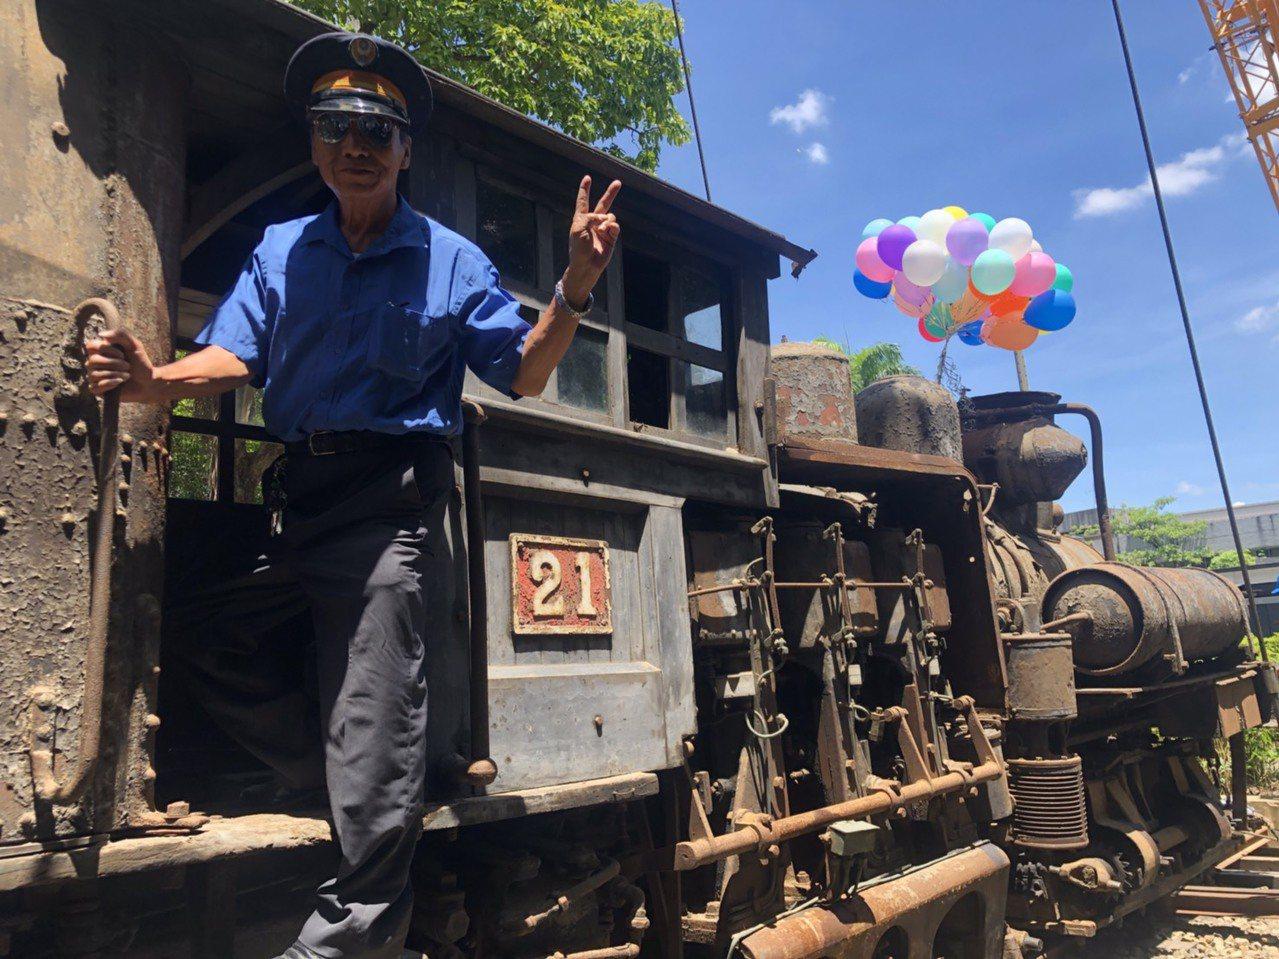 SL-21號蒸汽火車將調至北門車站,未來將以1200萬元修復,最後一任司機員呂文...